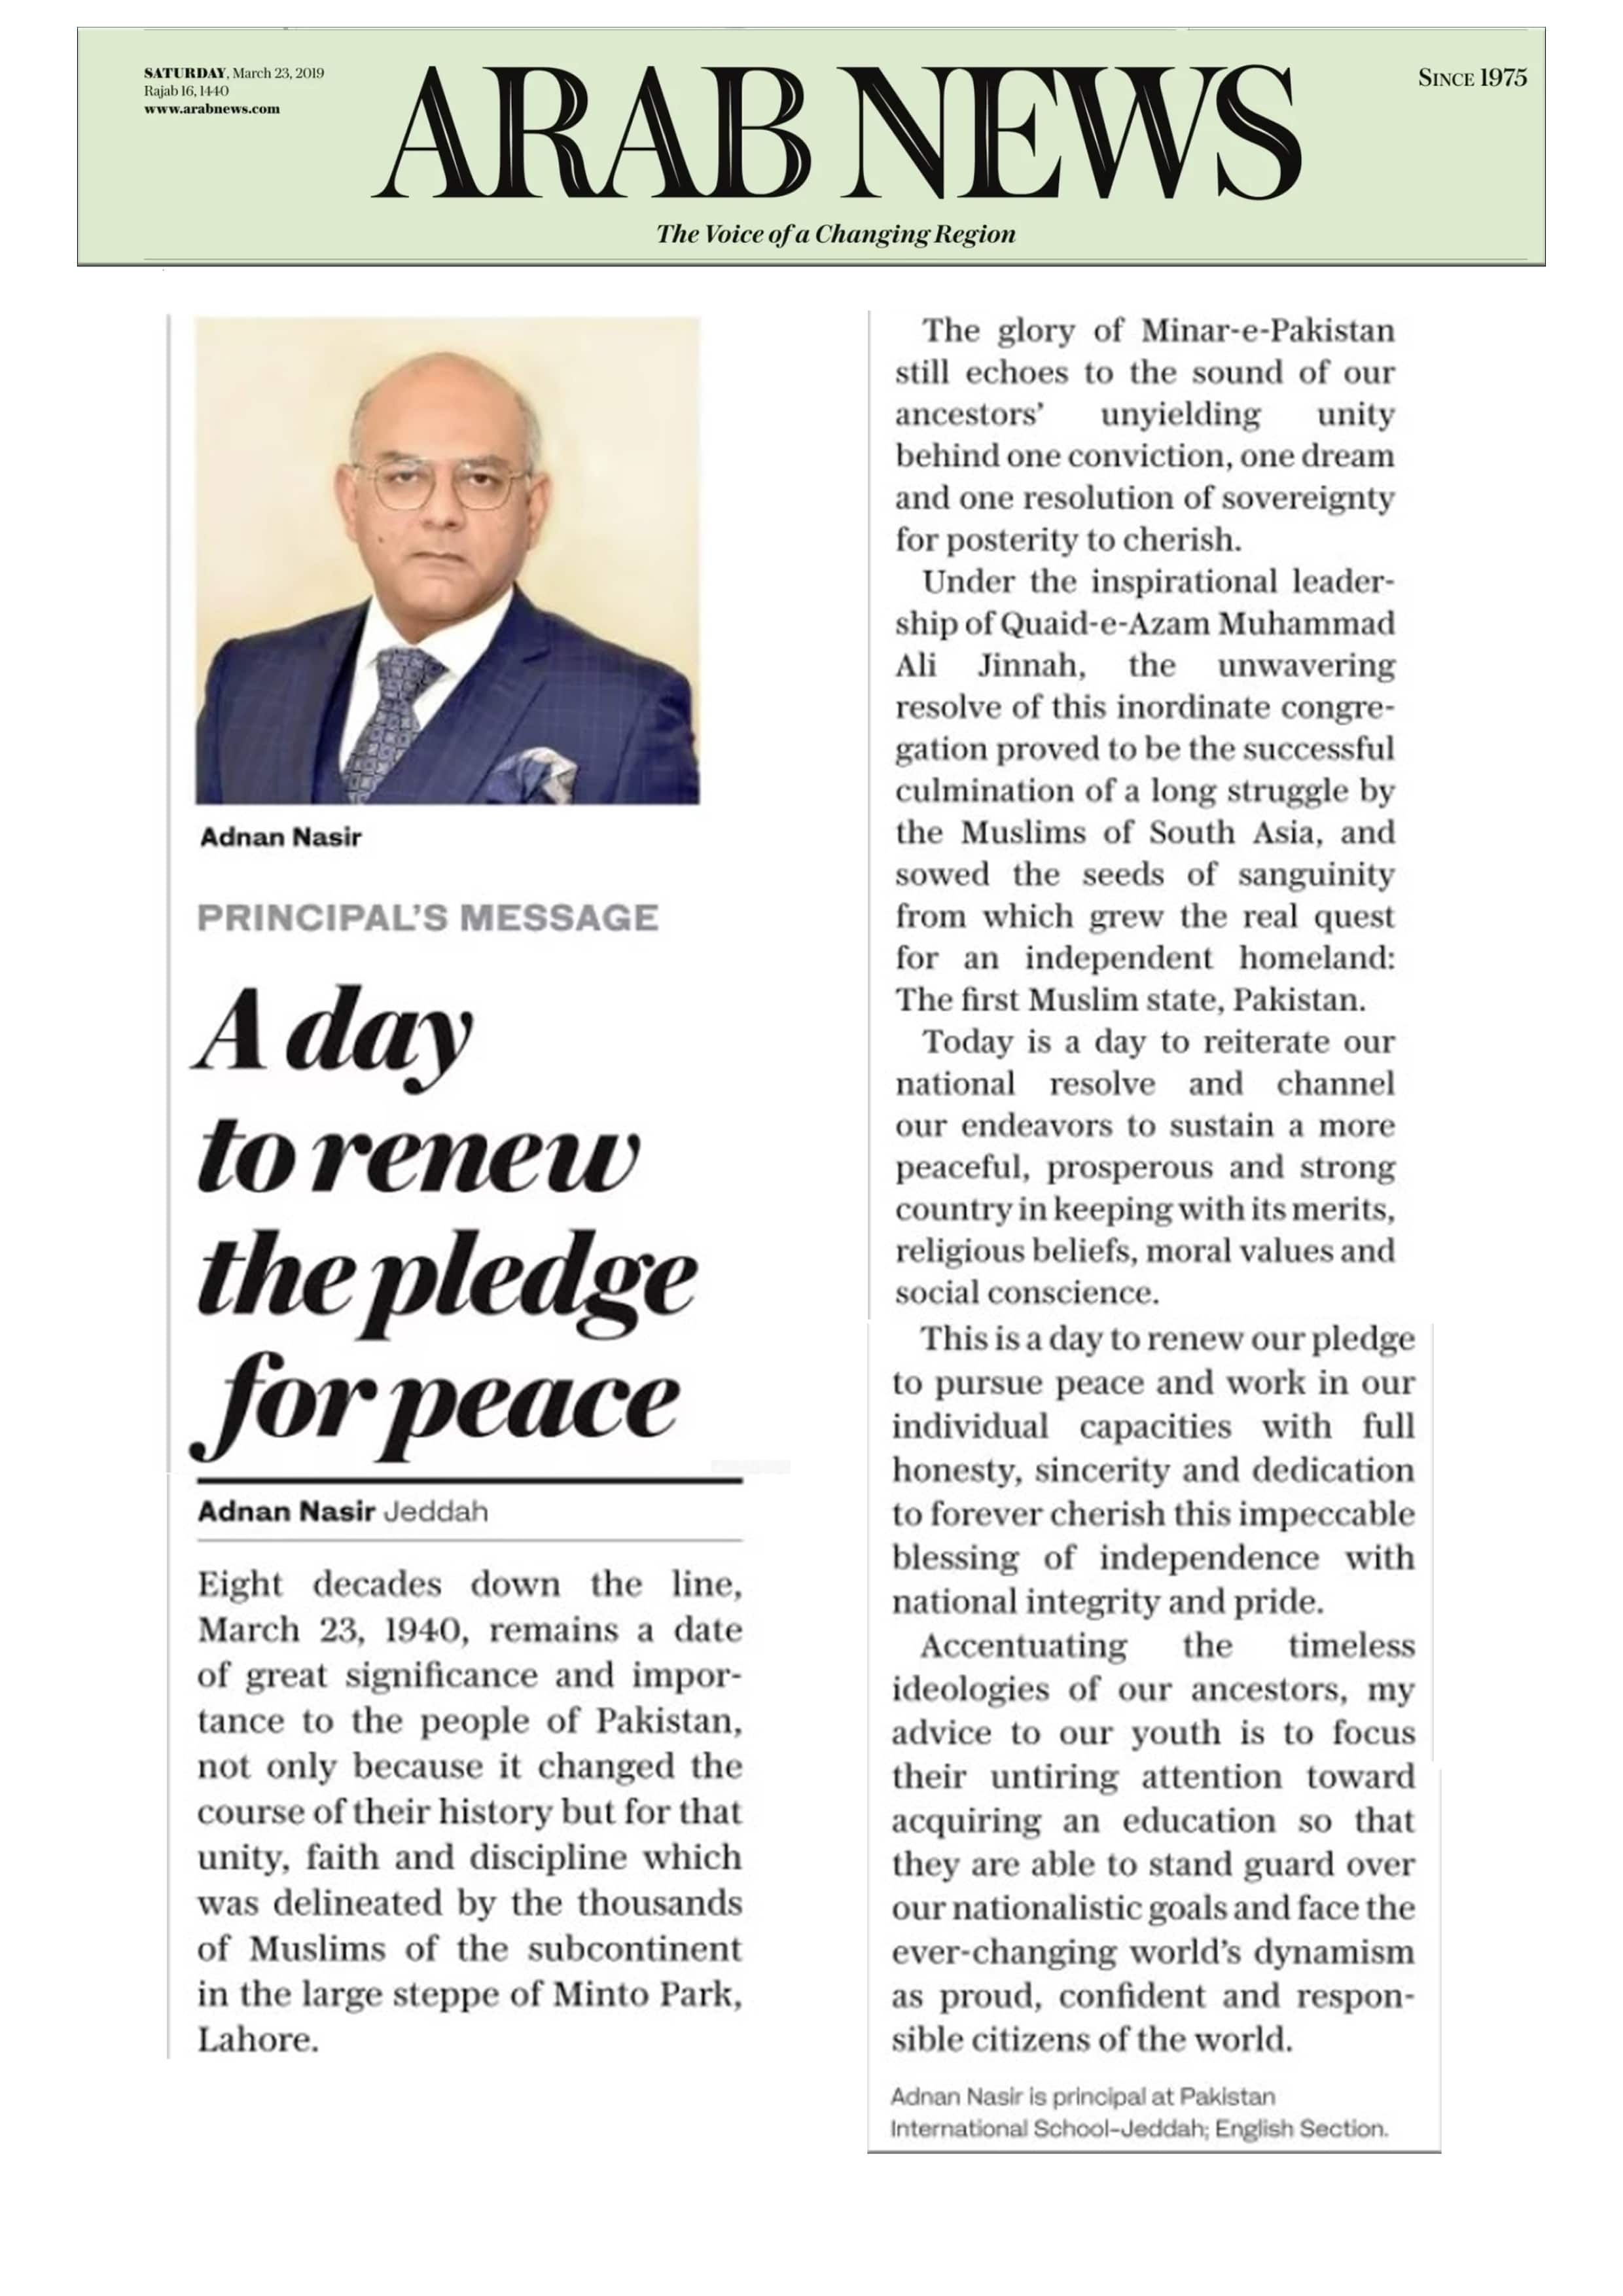 Gazette: Pakistan Resolution Day — A day to renew our pledge